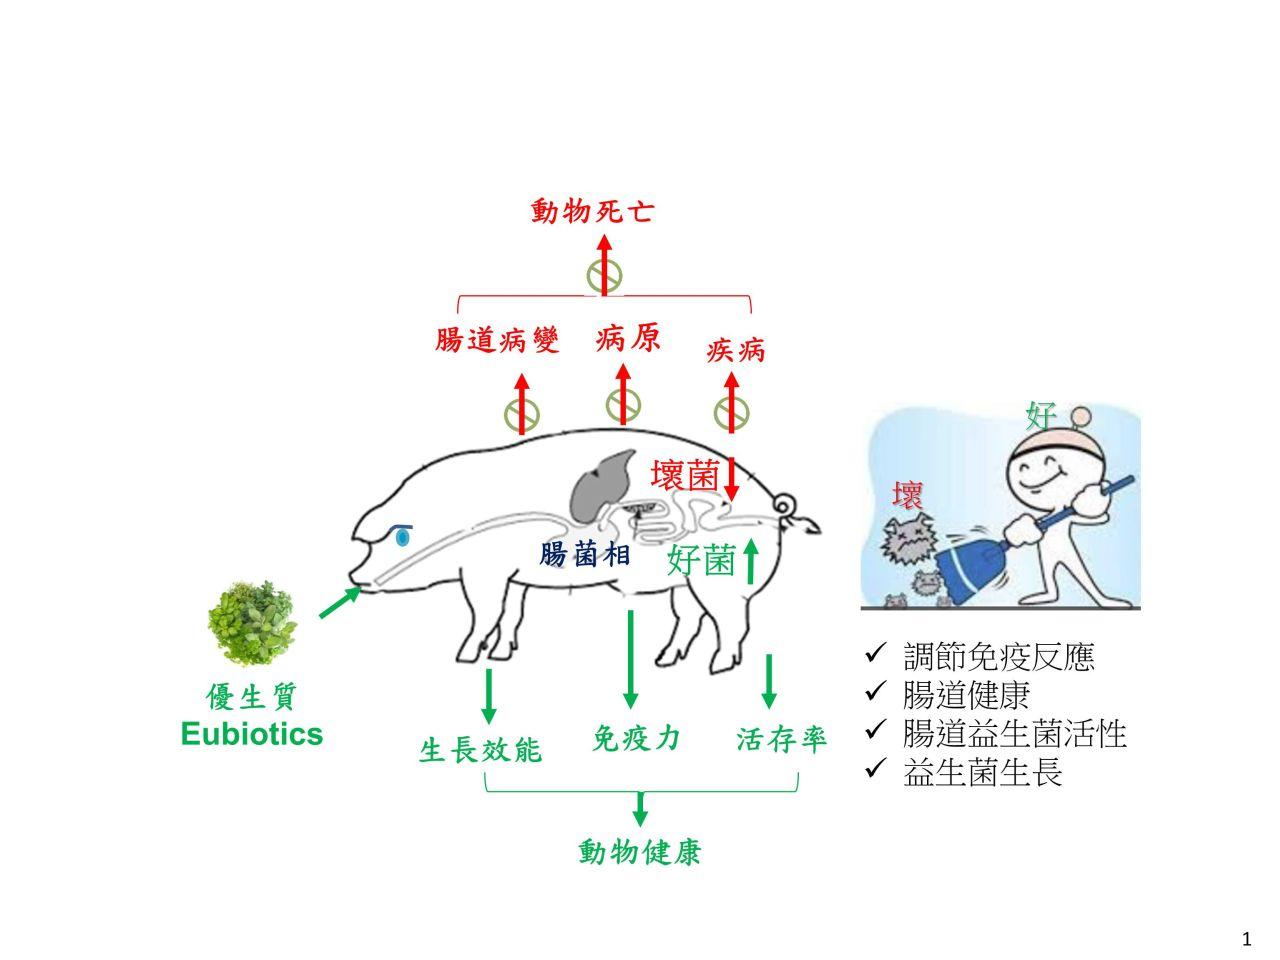 Eubiotics for human and animal health